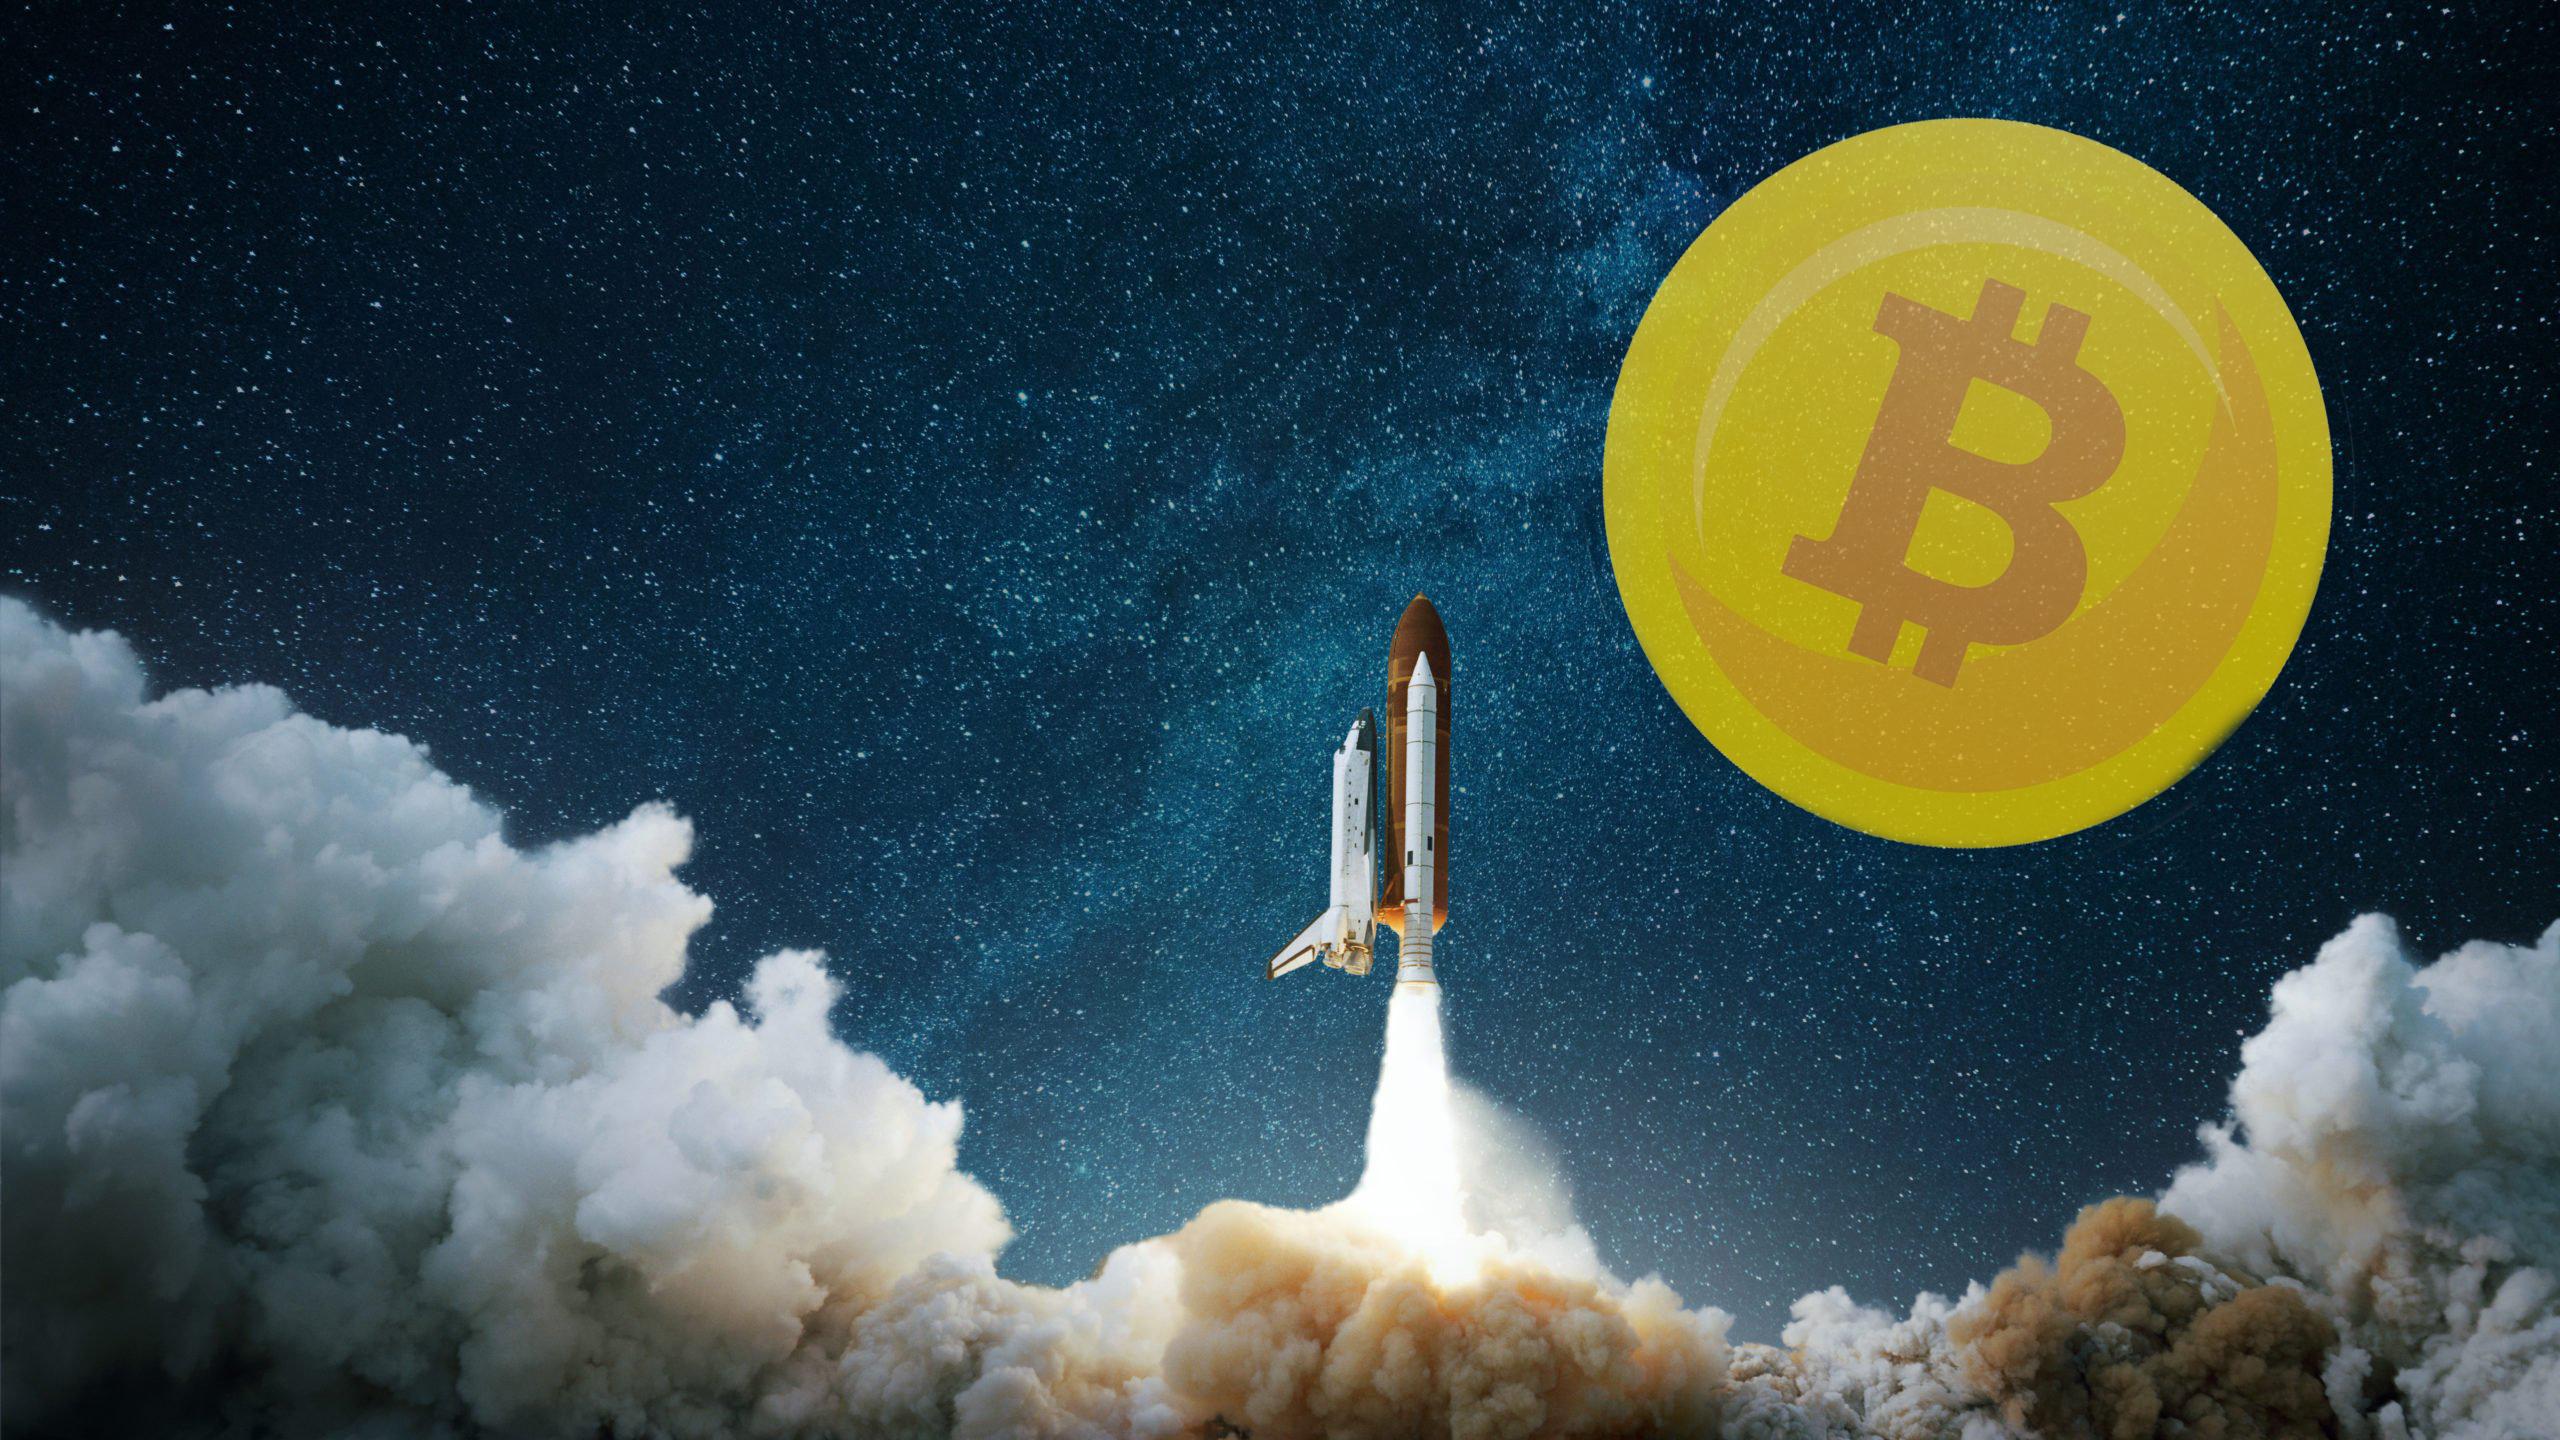 bitcoin 20 bin dolara ulaşabilir btc